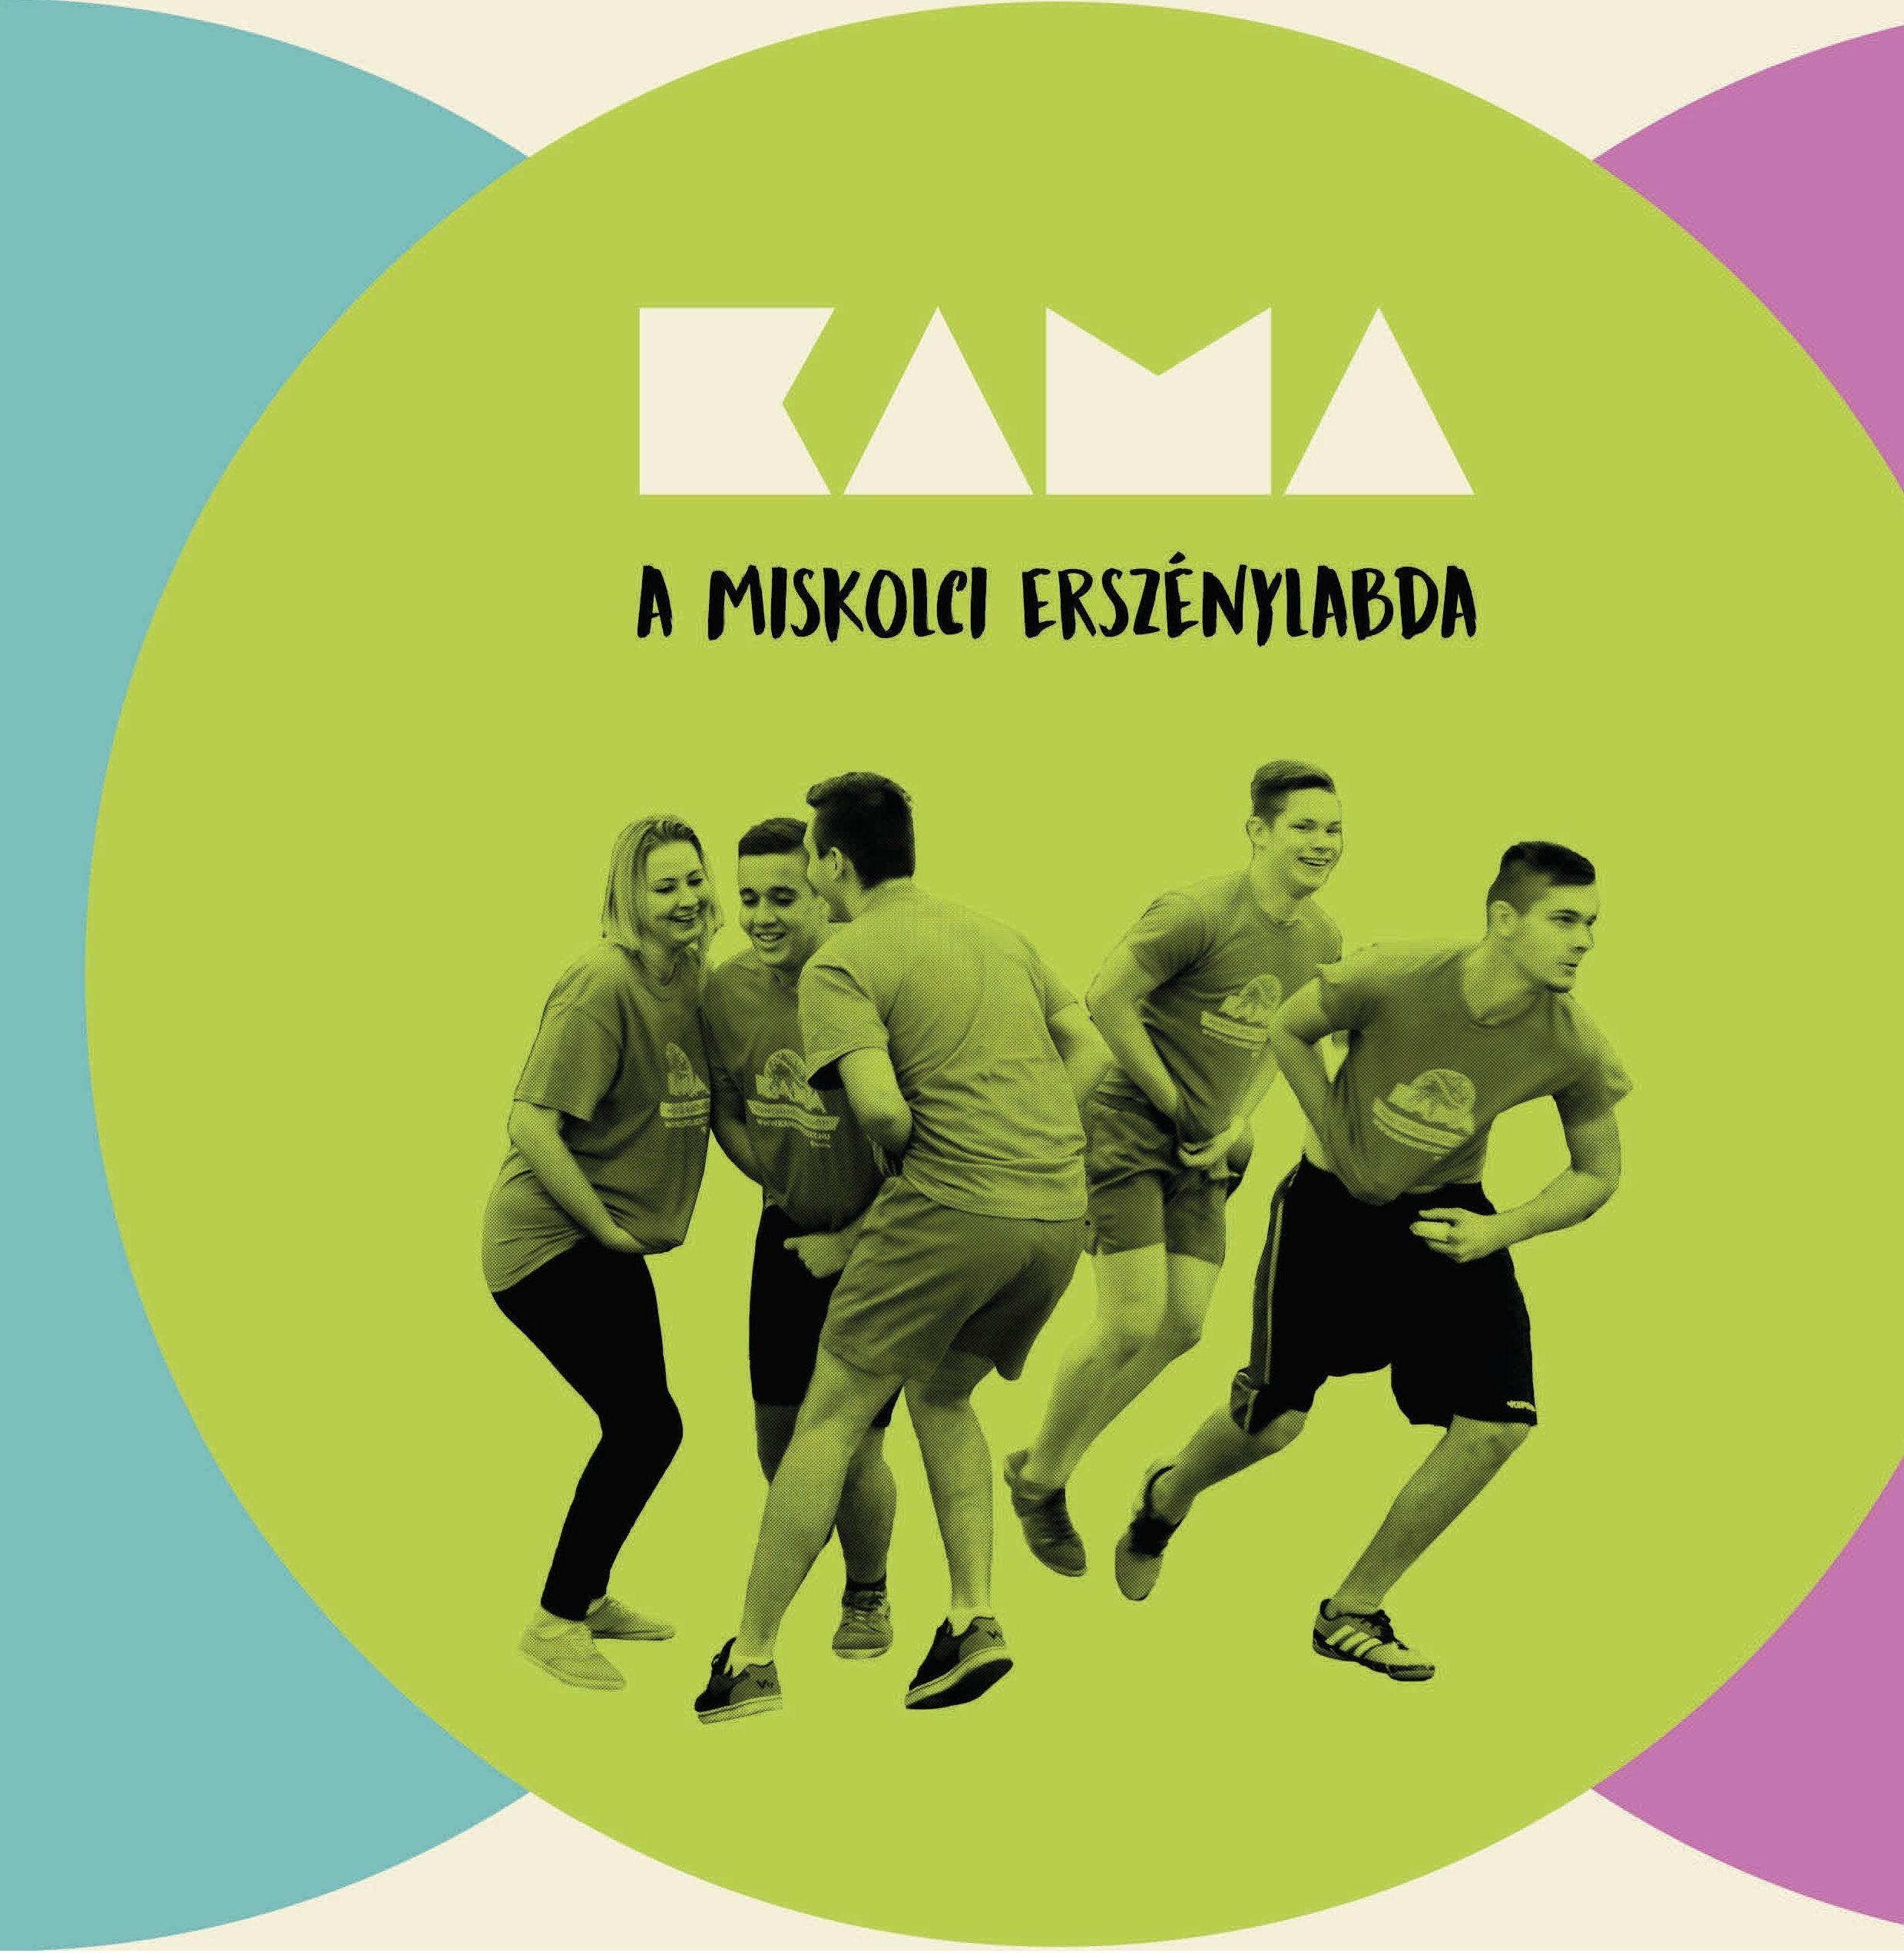 kama_kiad_I -borító